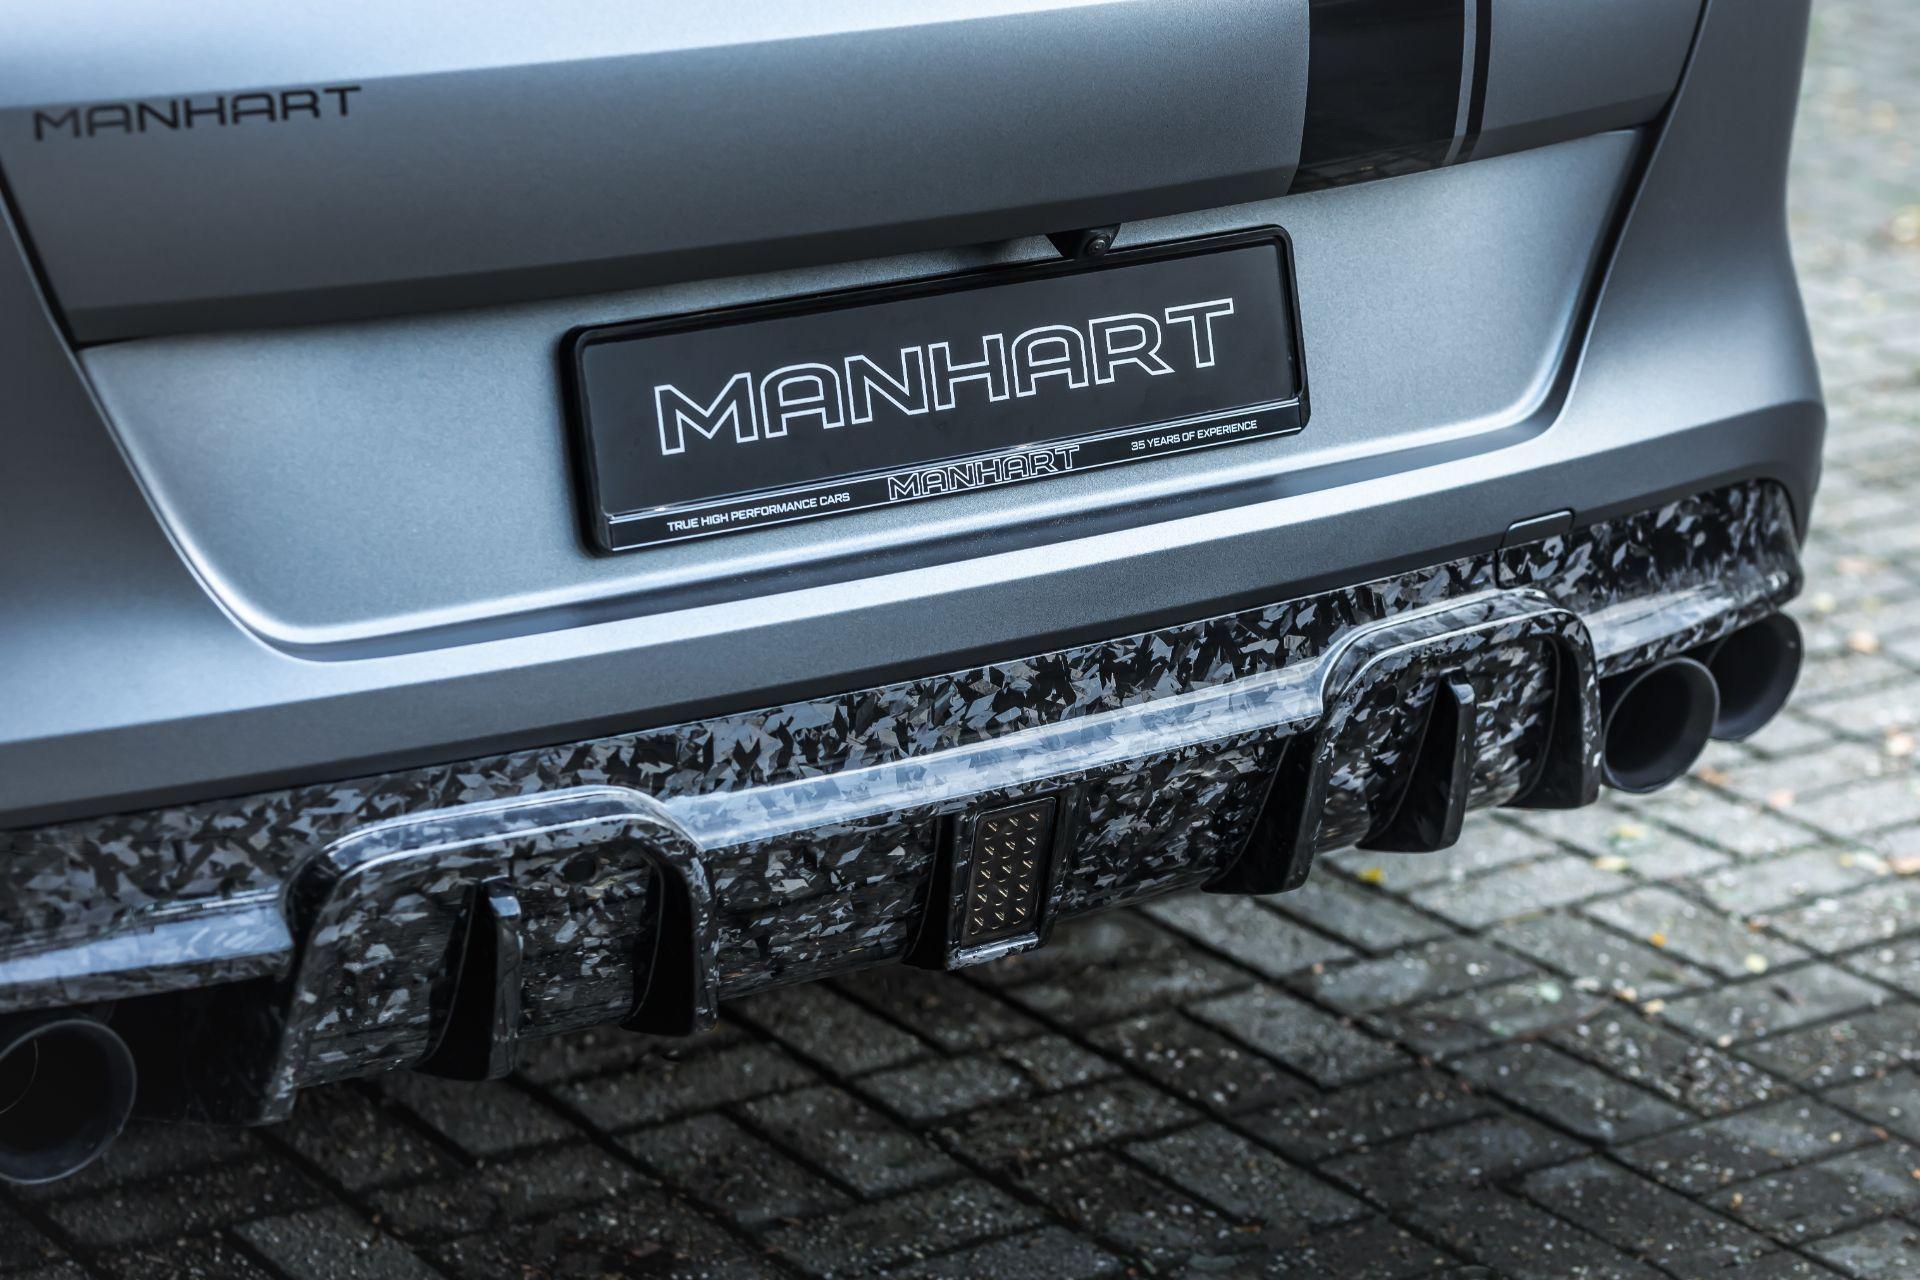 Manhart-Performance-MHX-6-700-Forged-Carbon-17